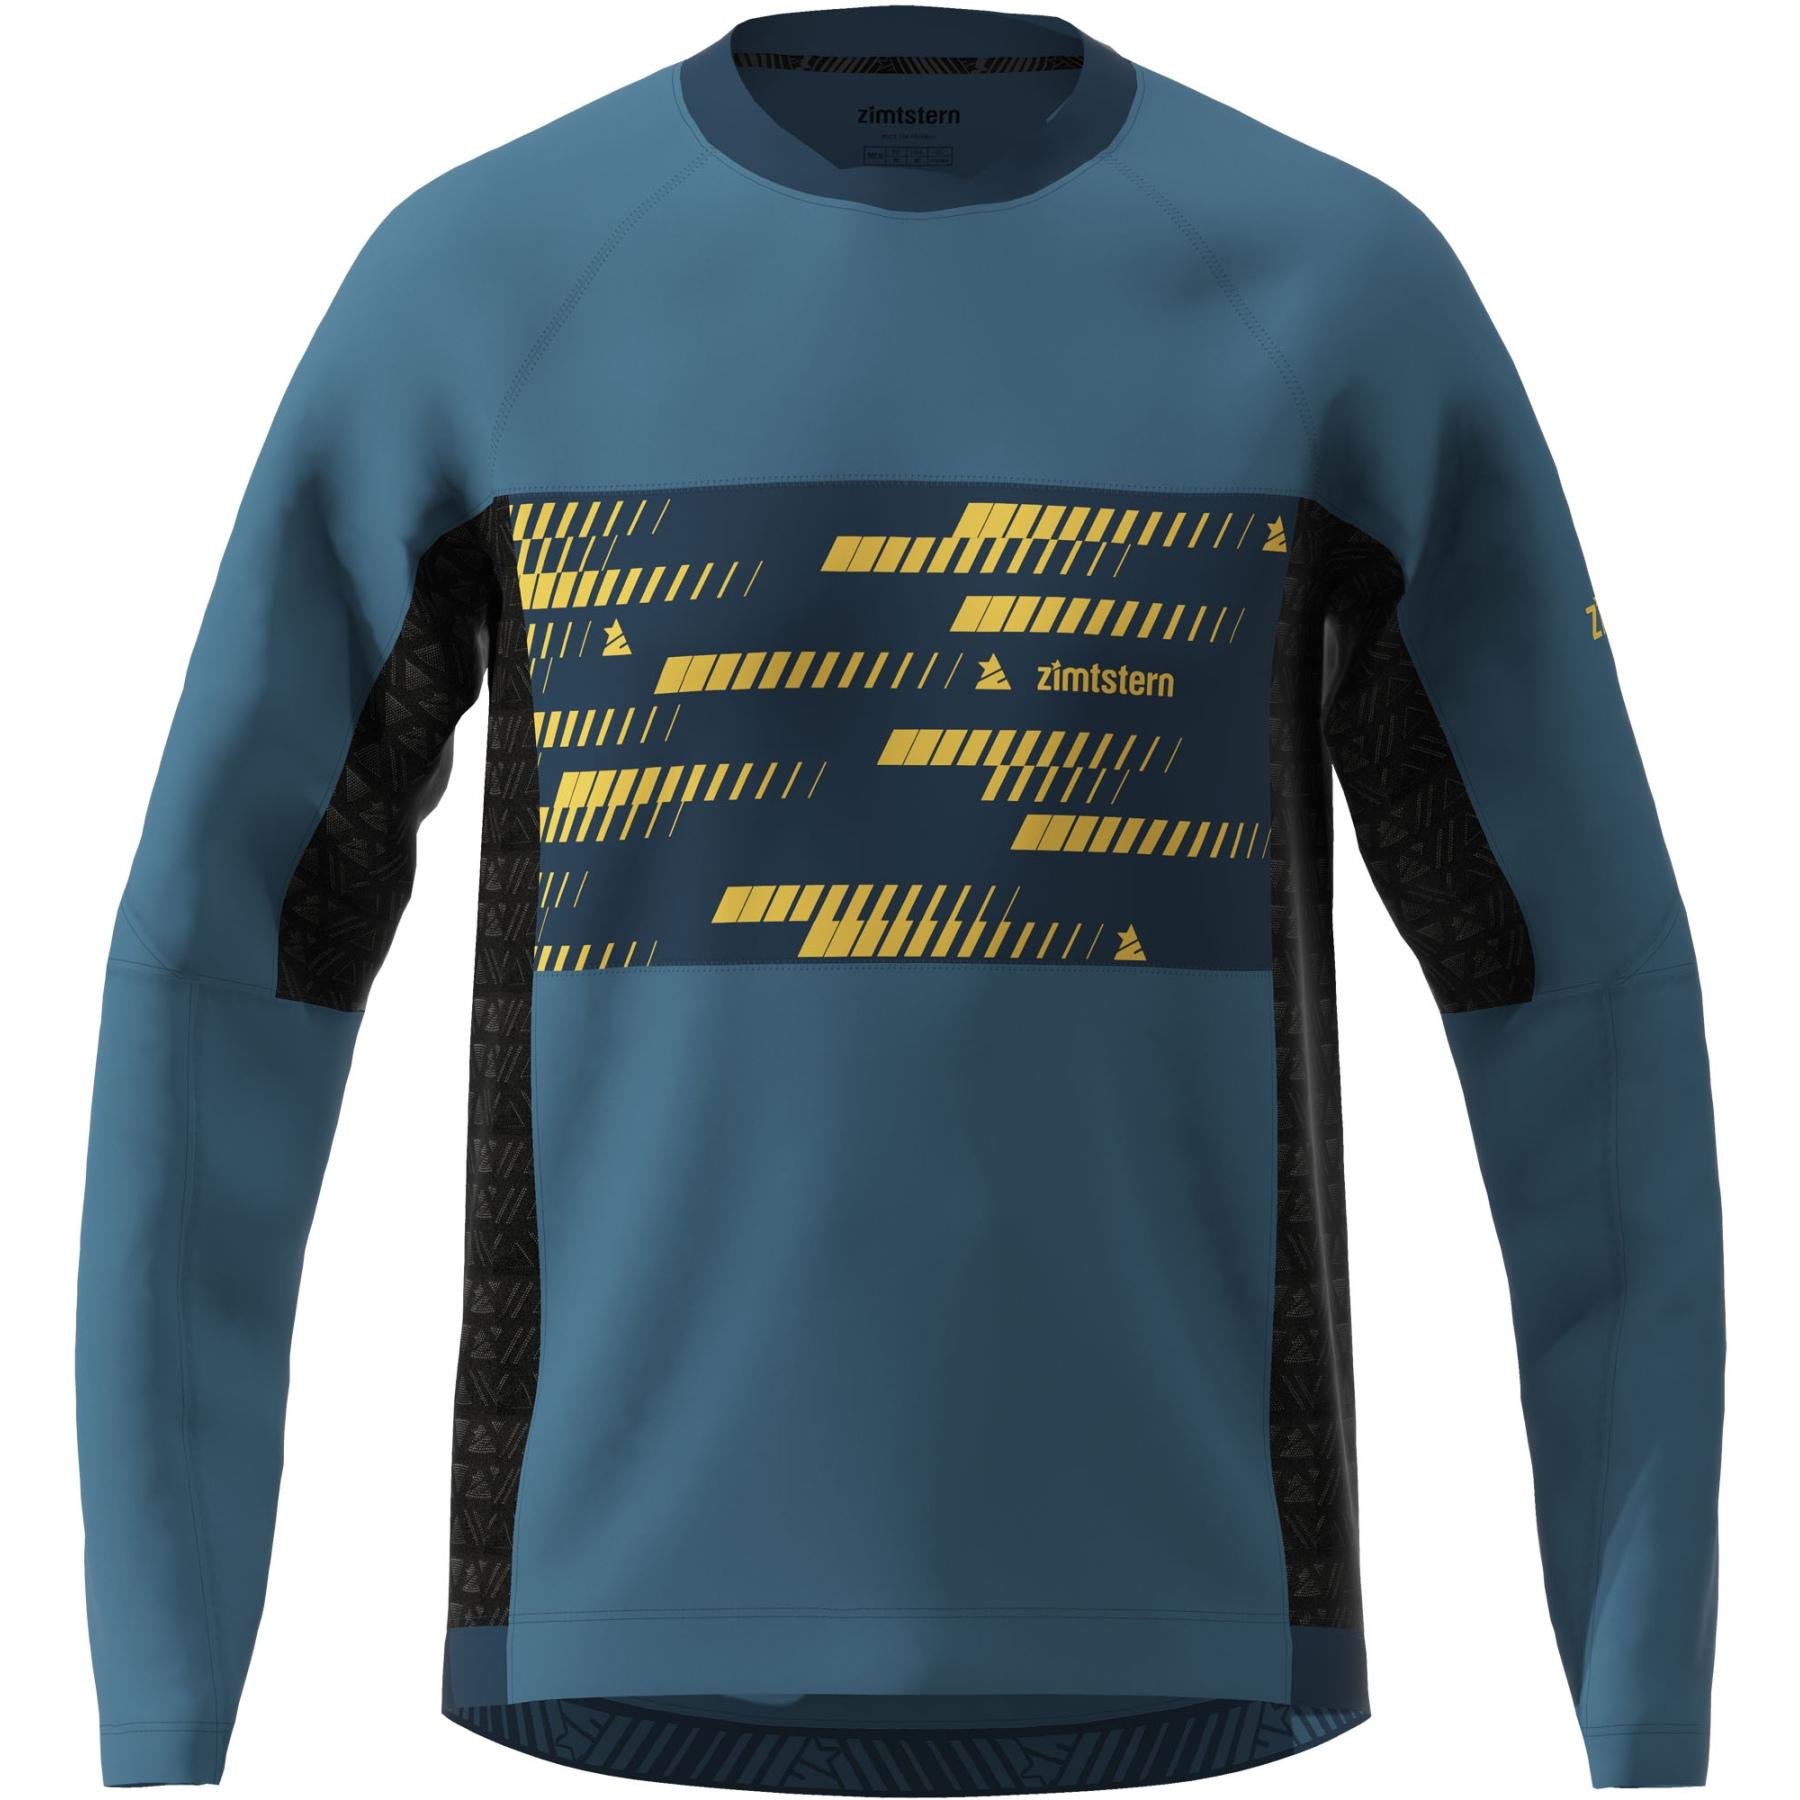 Zimtstern TechZonez Langarm-Shirt - blue steel/french navy